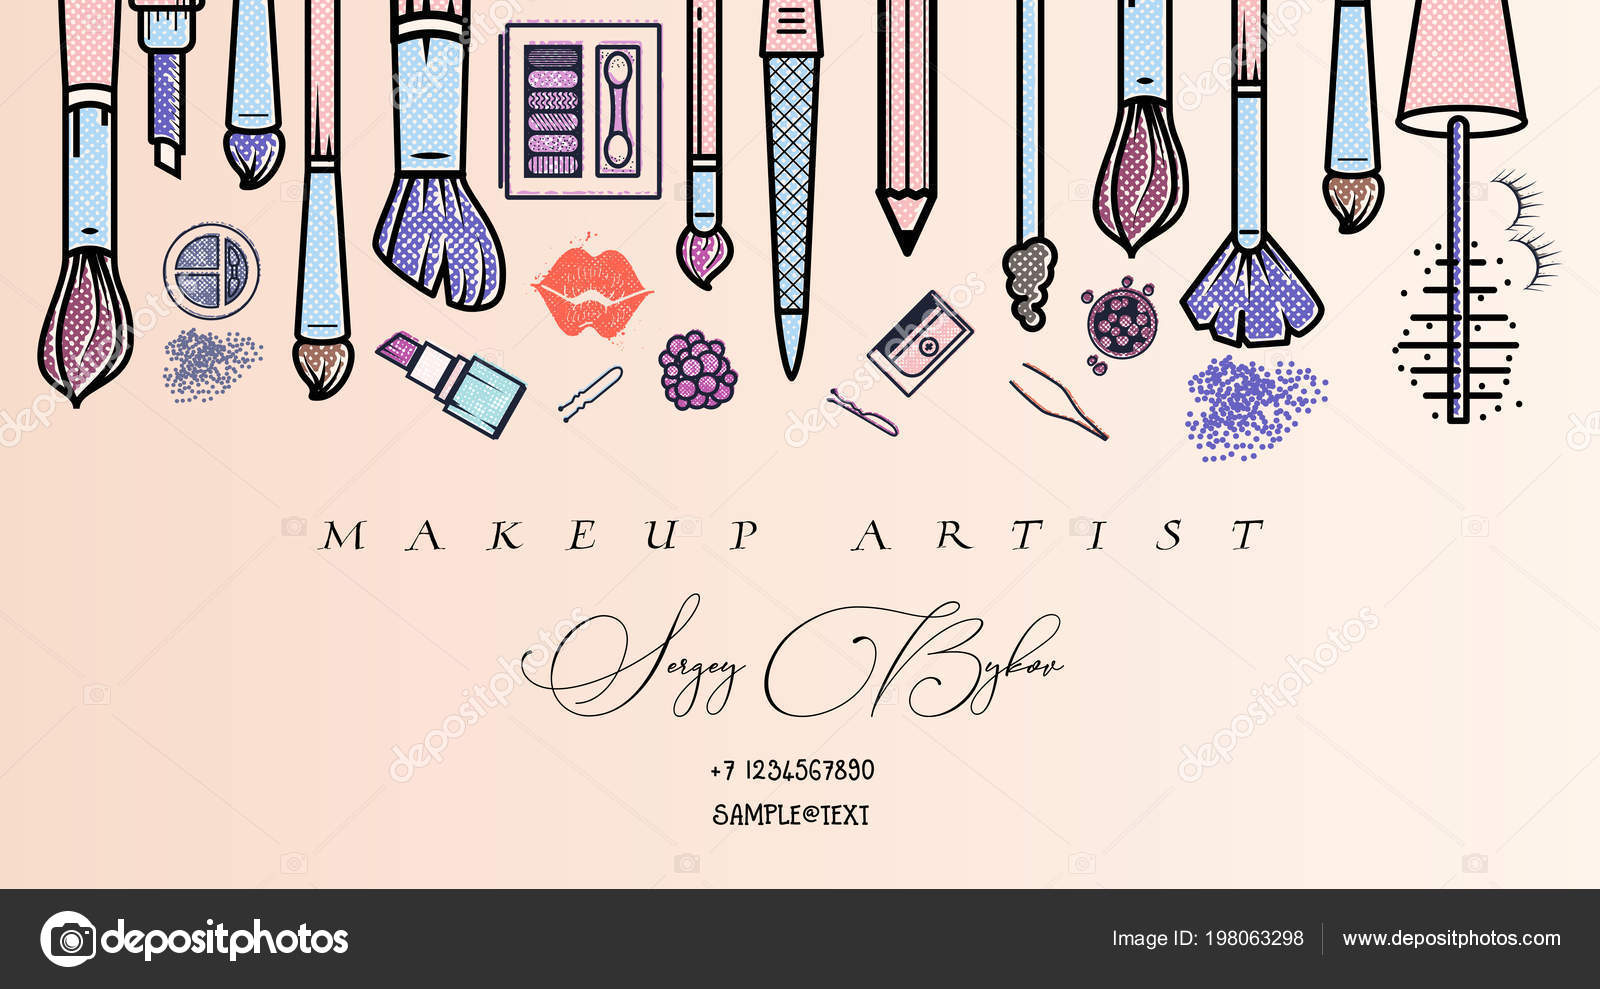 Makeup Artist Banner Beauty Salon Fashion Trends Background Business Concept Stock Vector C Zao4nik 198063298